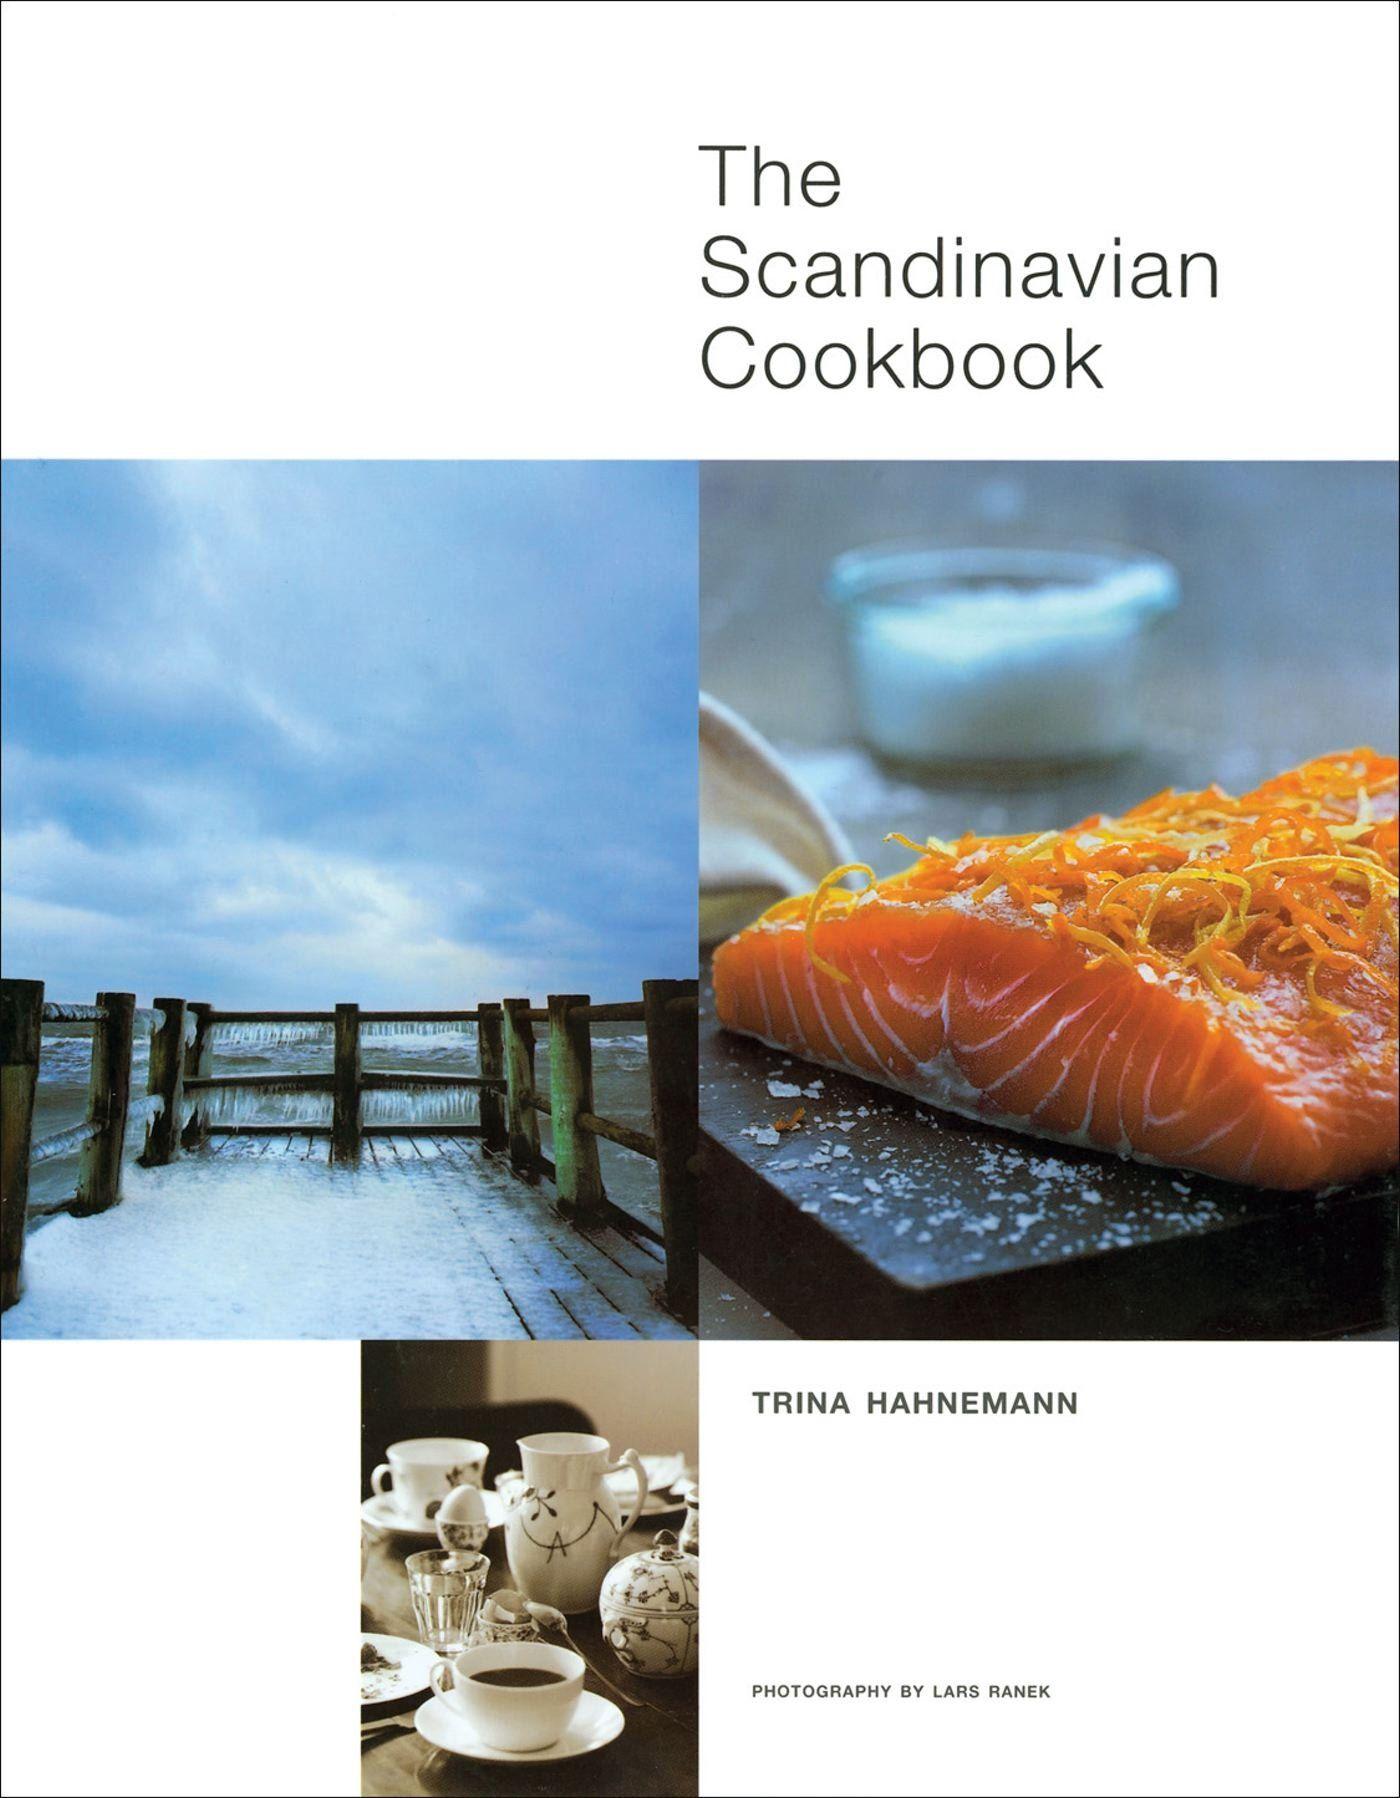 The Scandinavian Cookbook: Trina Hahnemann: 9780740780943: Amazon.com: Books